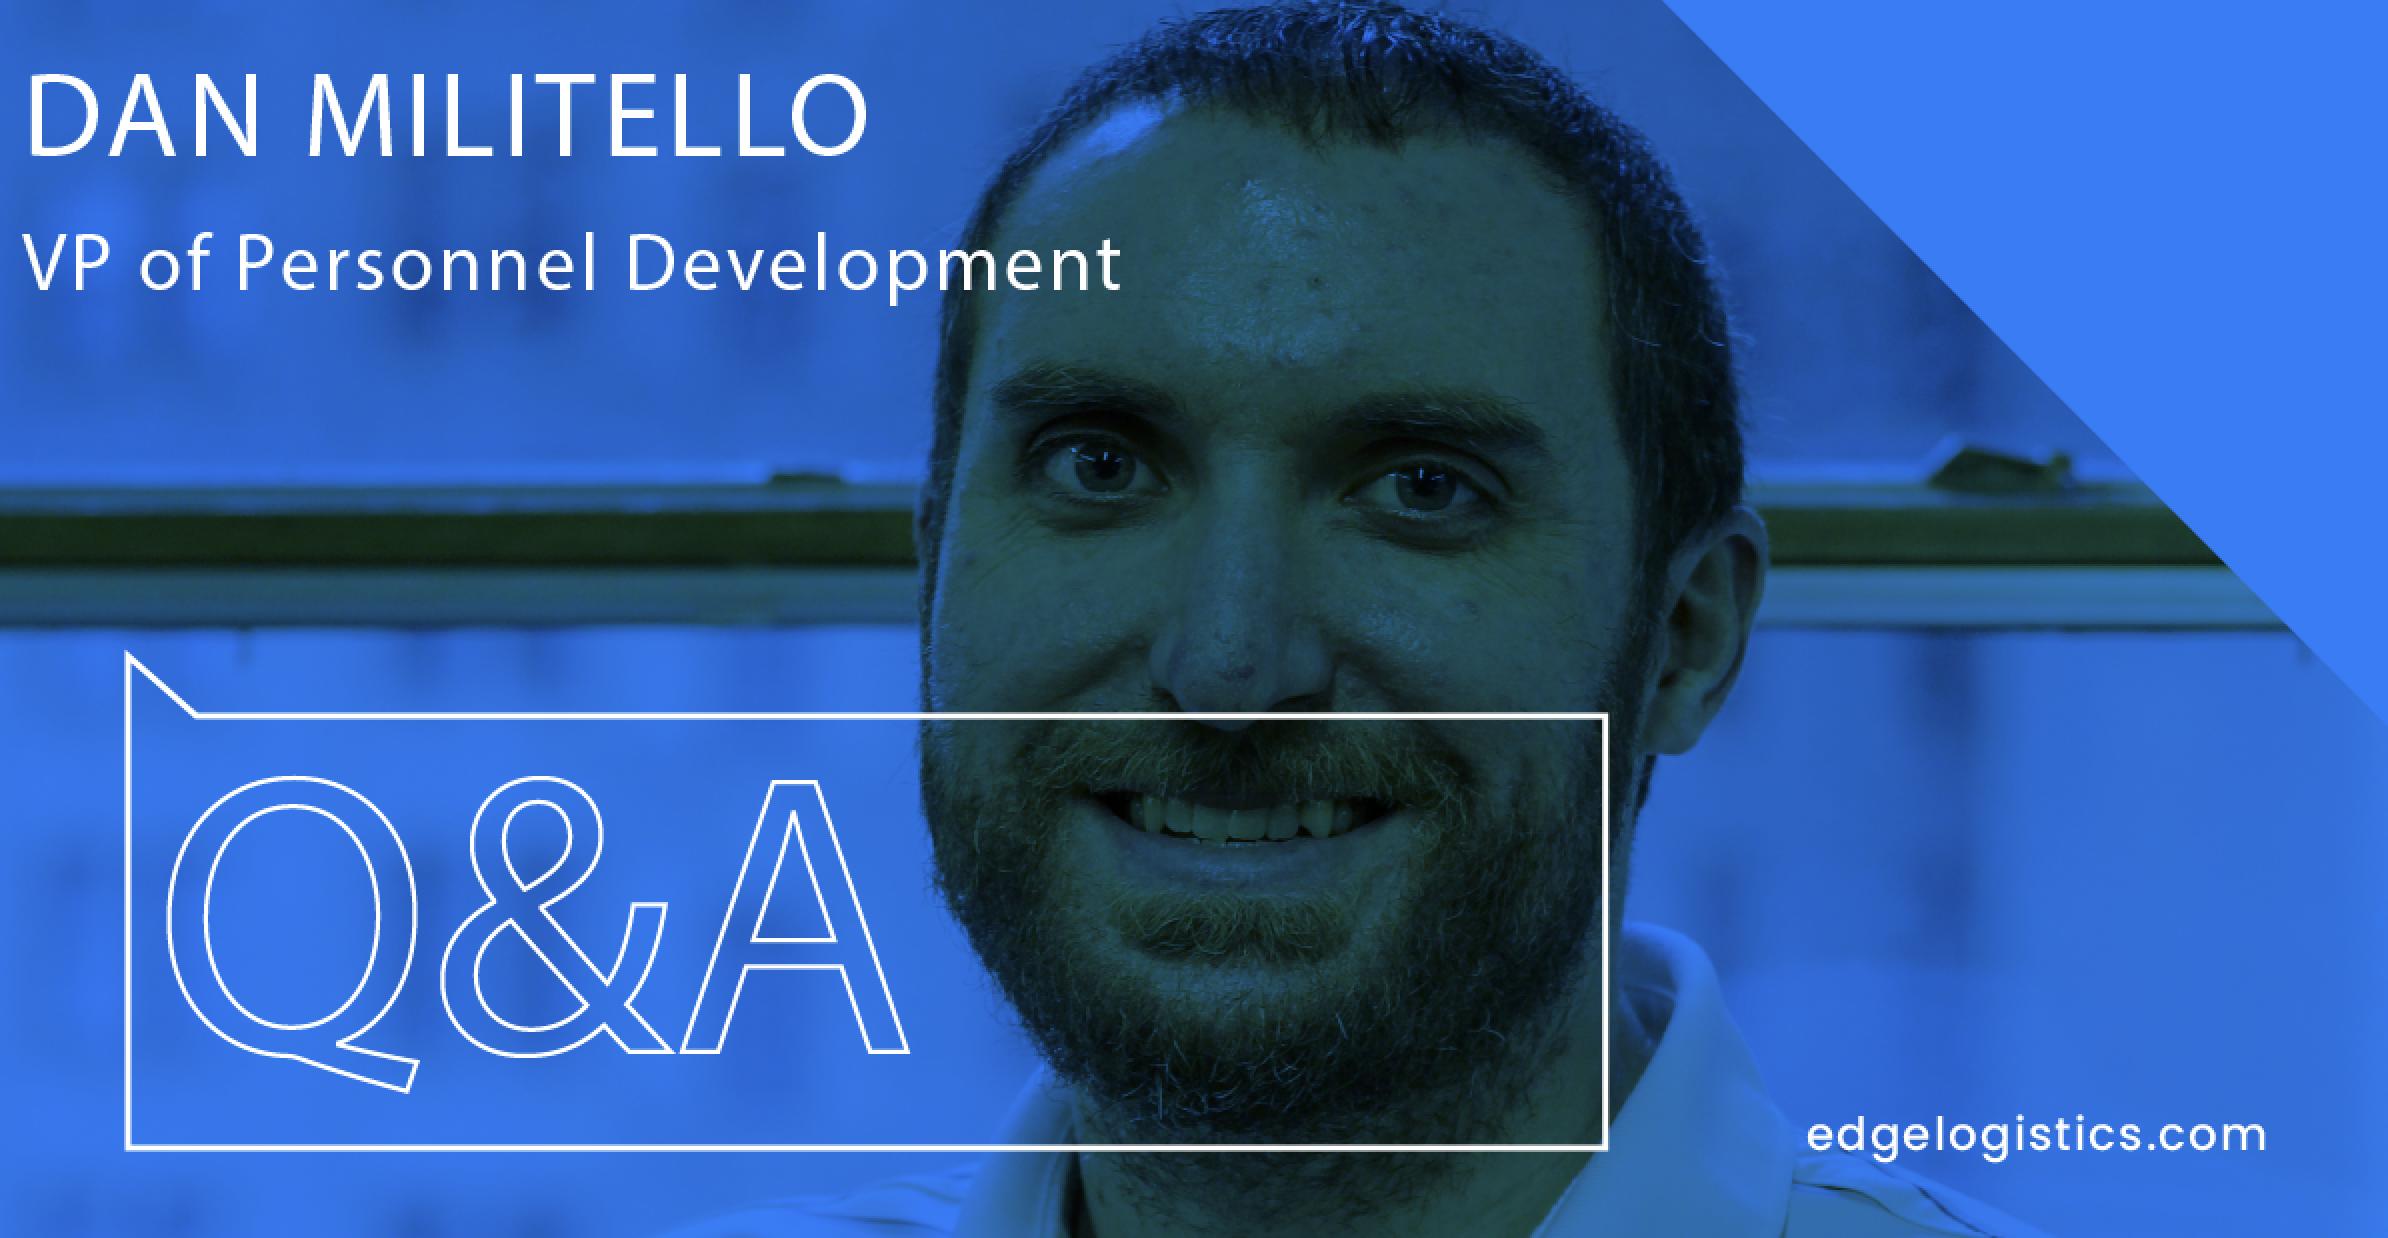 Meet our Vice President of Personnel Development, Dan Militello